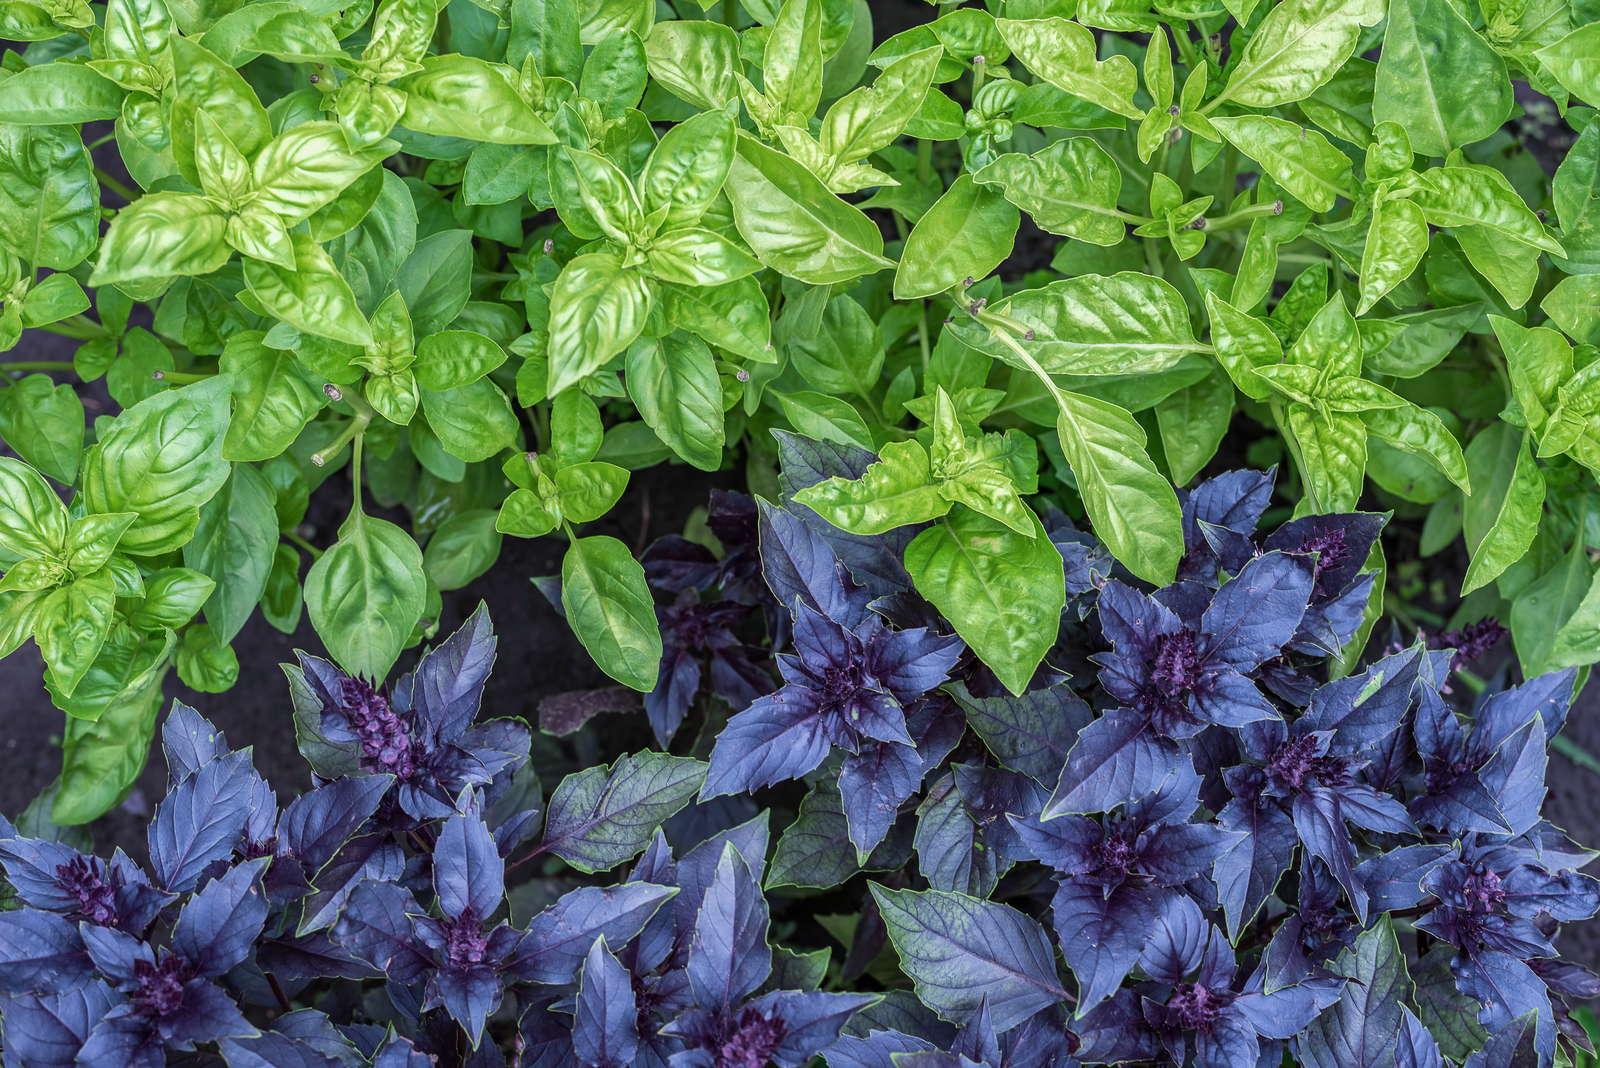 Basilikumsorten: Vielfalt in Geruch & Geschmack